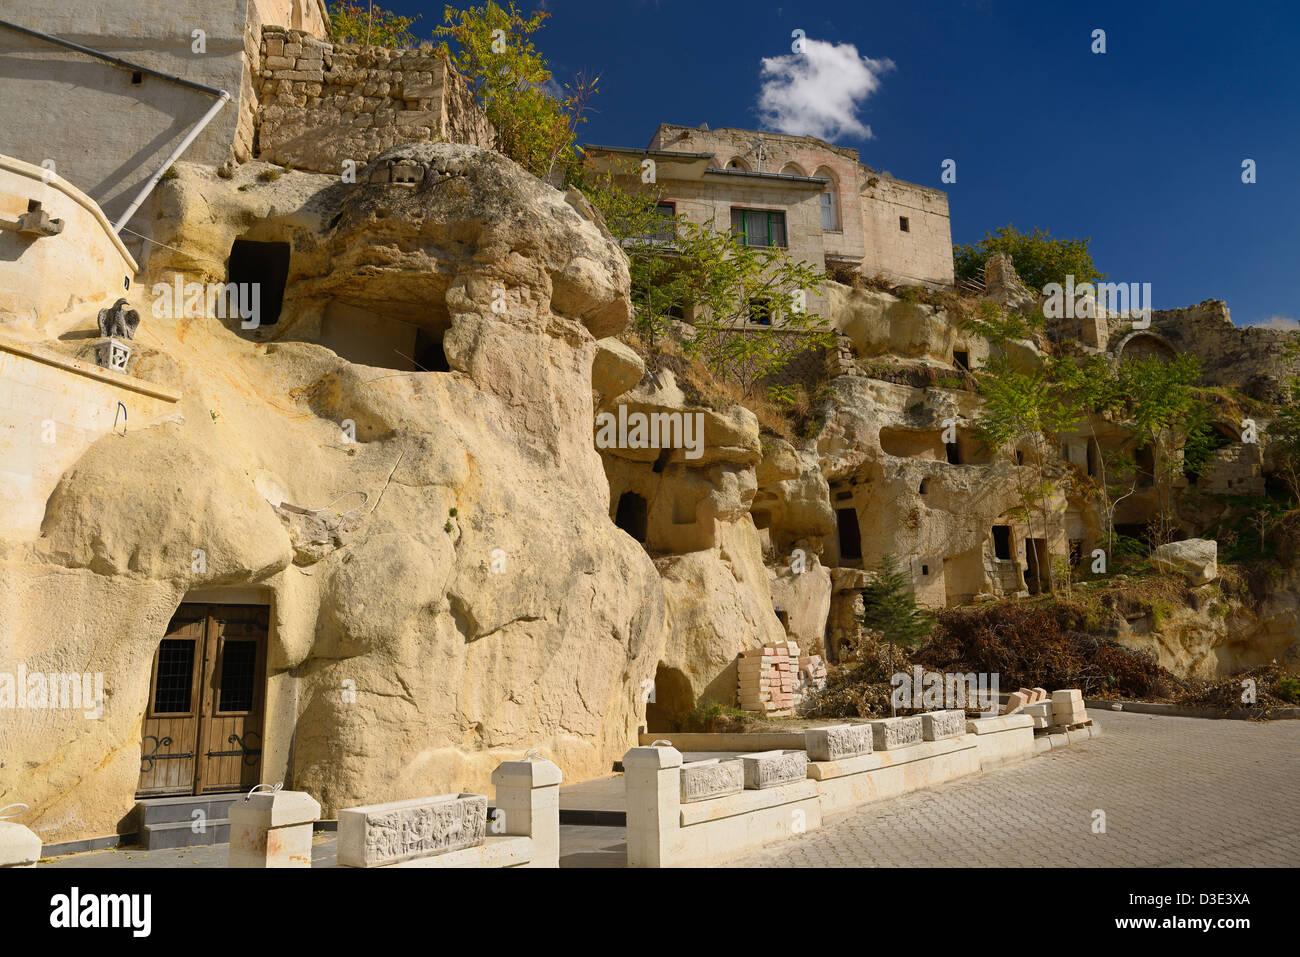 Construction development on volcanic tuff cave houses at Mustafapasa Nevsehir Cappadocia Turkey - Stock Image